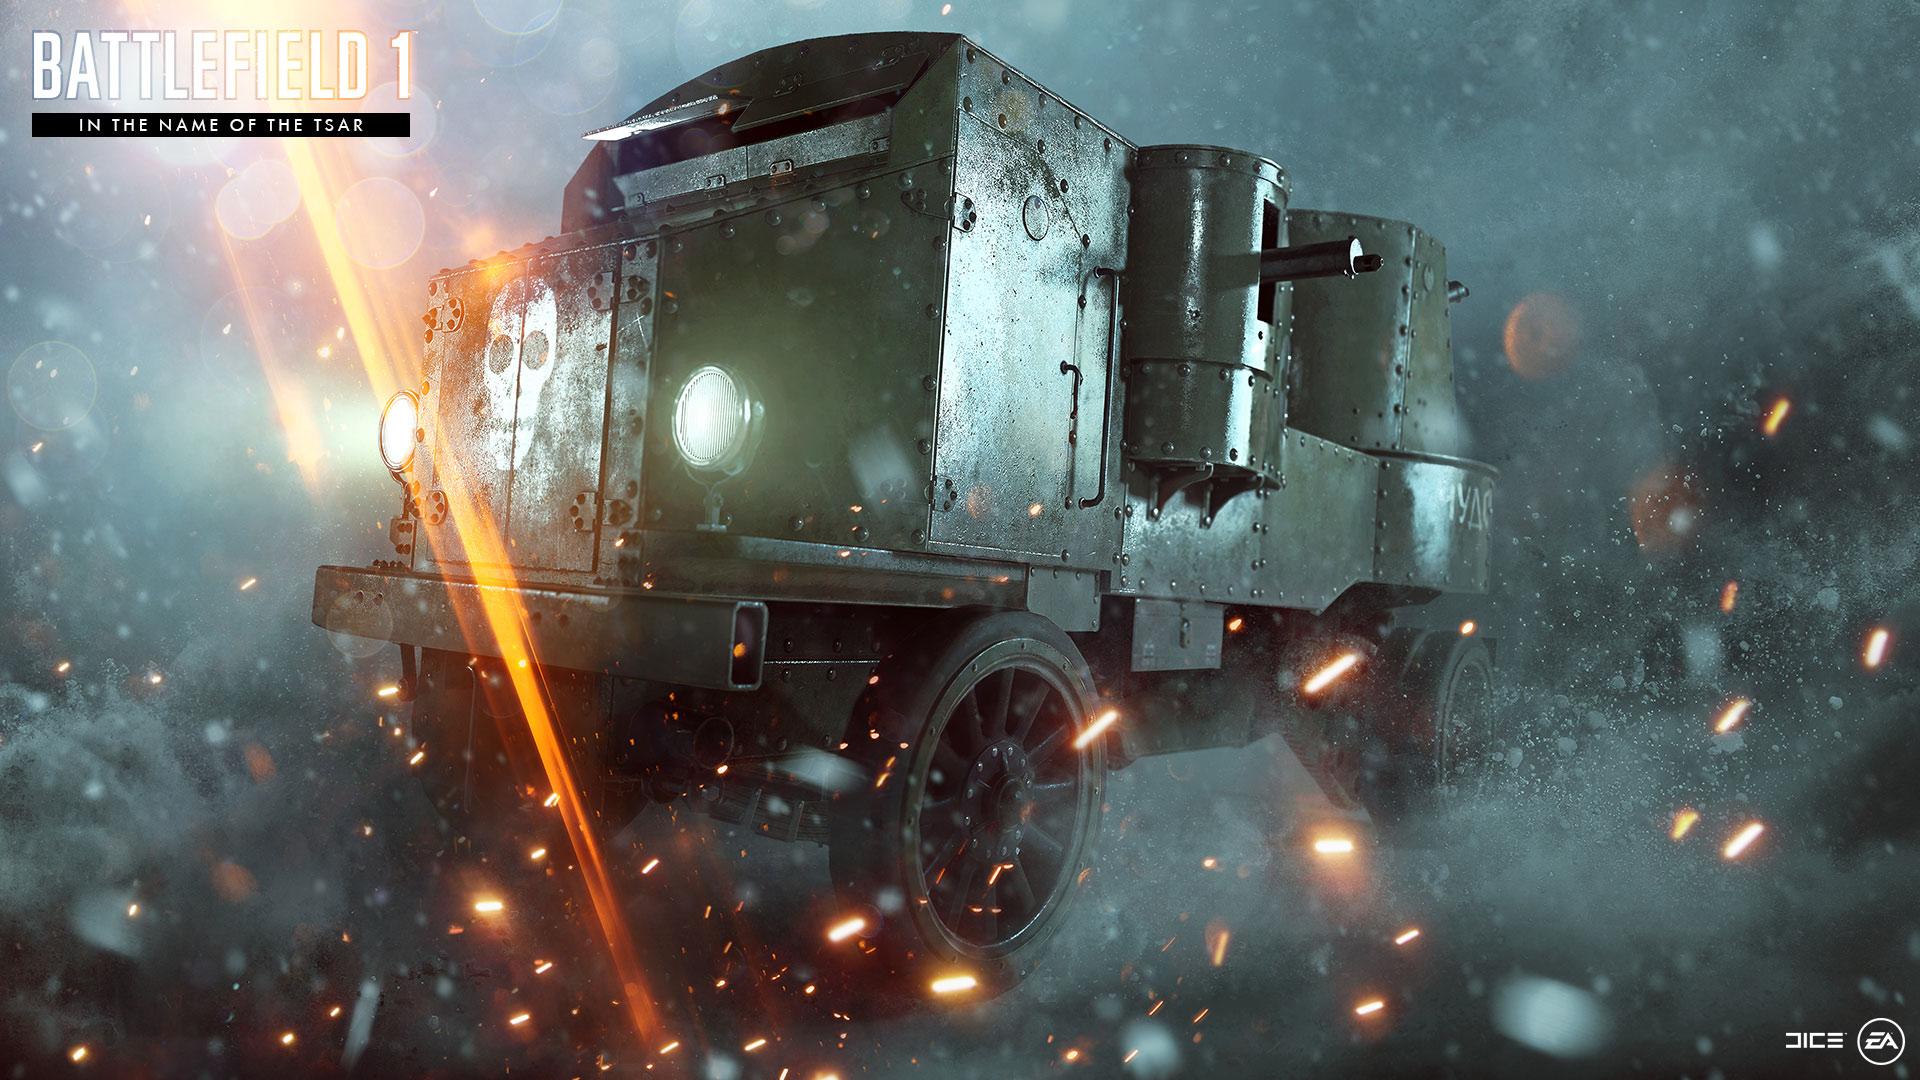 https://media-www-battlefieldwebcore.spark.ea.com/content/battlefield-portal/fr_FR/games/battlefield-1/in-the-name-of-the-tsar/_jcr_content/par/section_2/columns/column/content/editorial_1/image/large.img.jpg